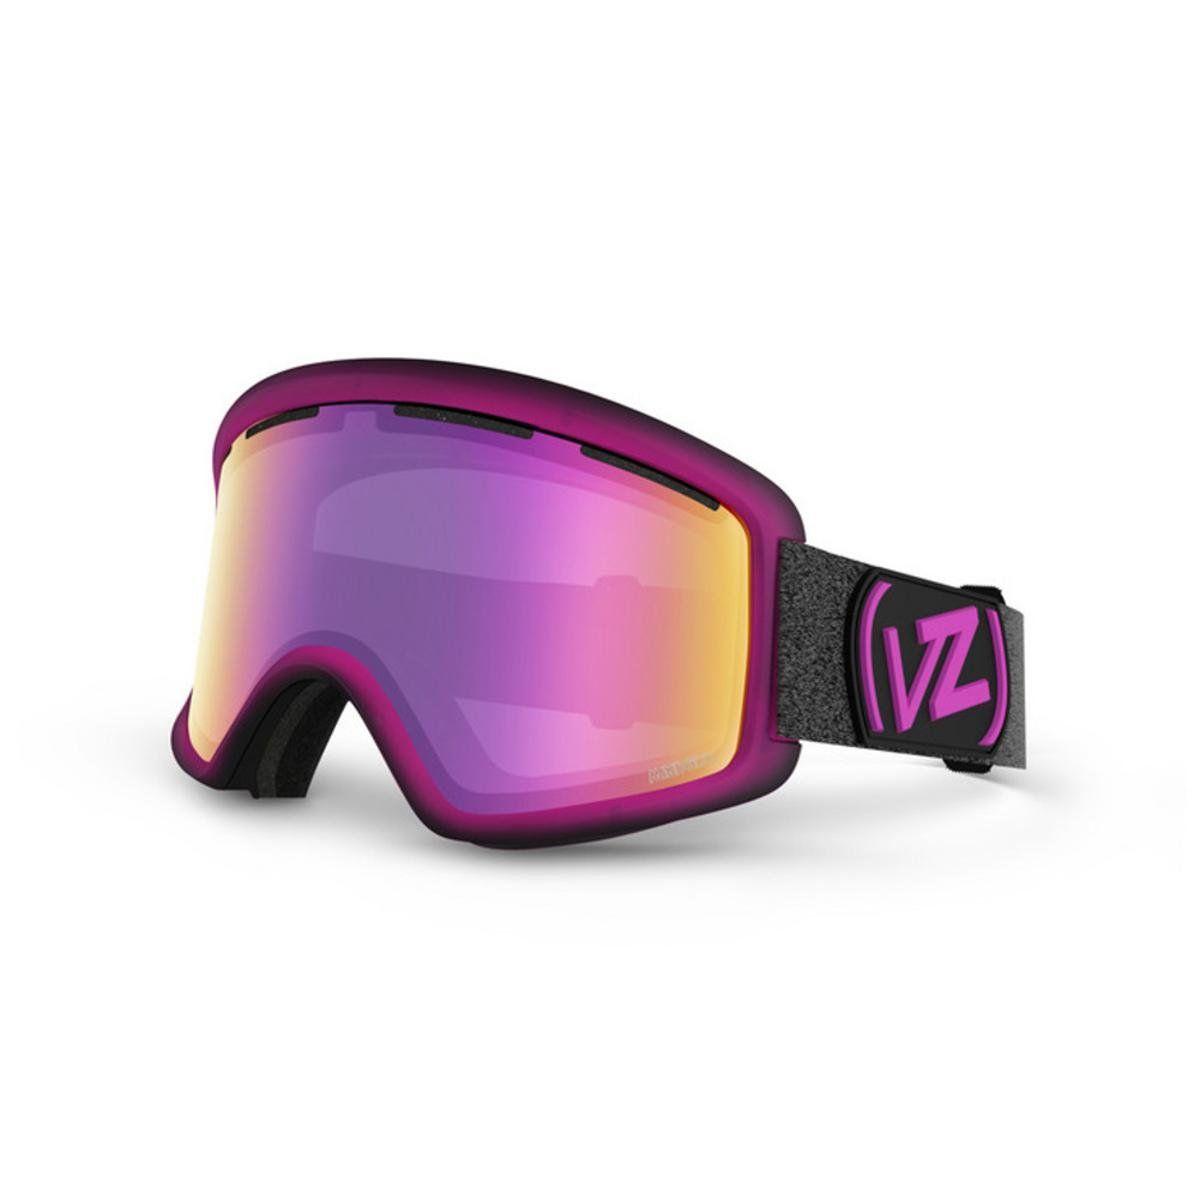 bf71543d86ba VonZipper Beefy Goggles